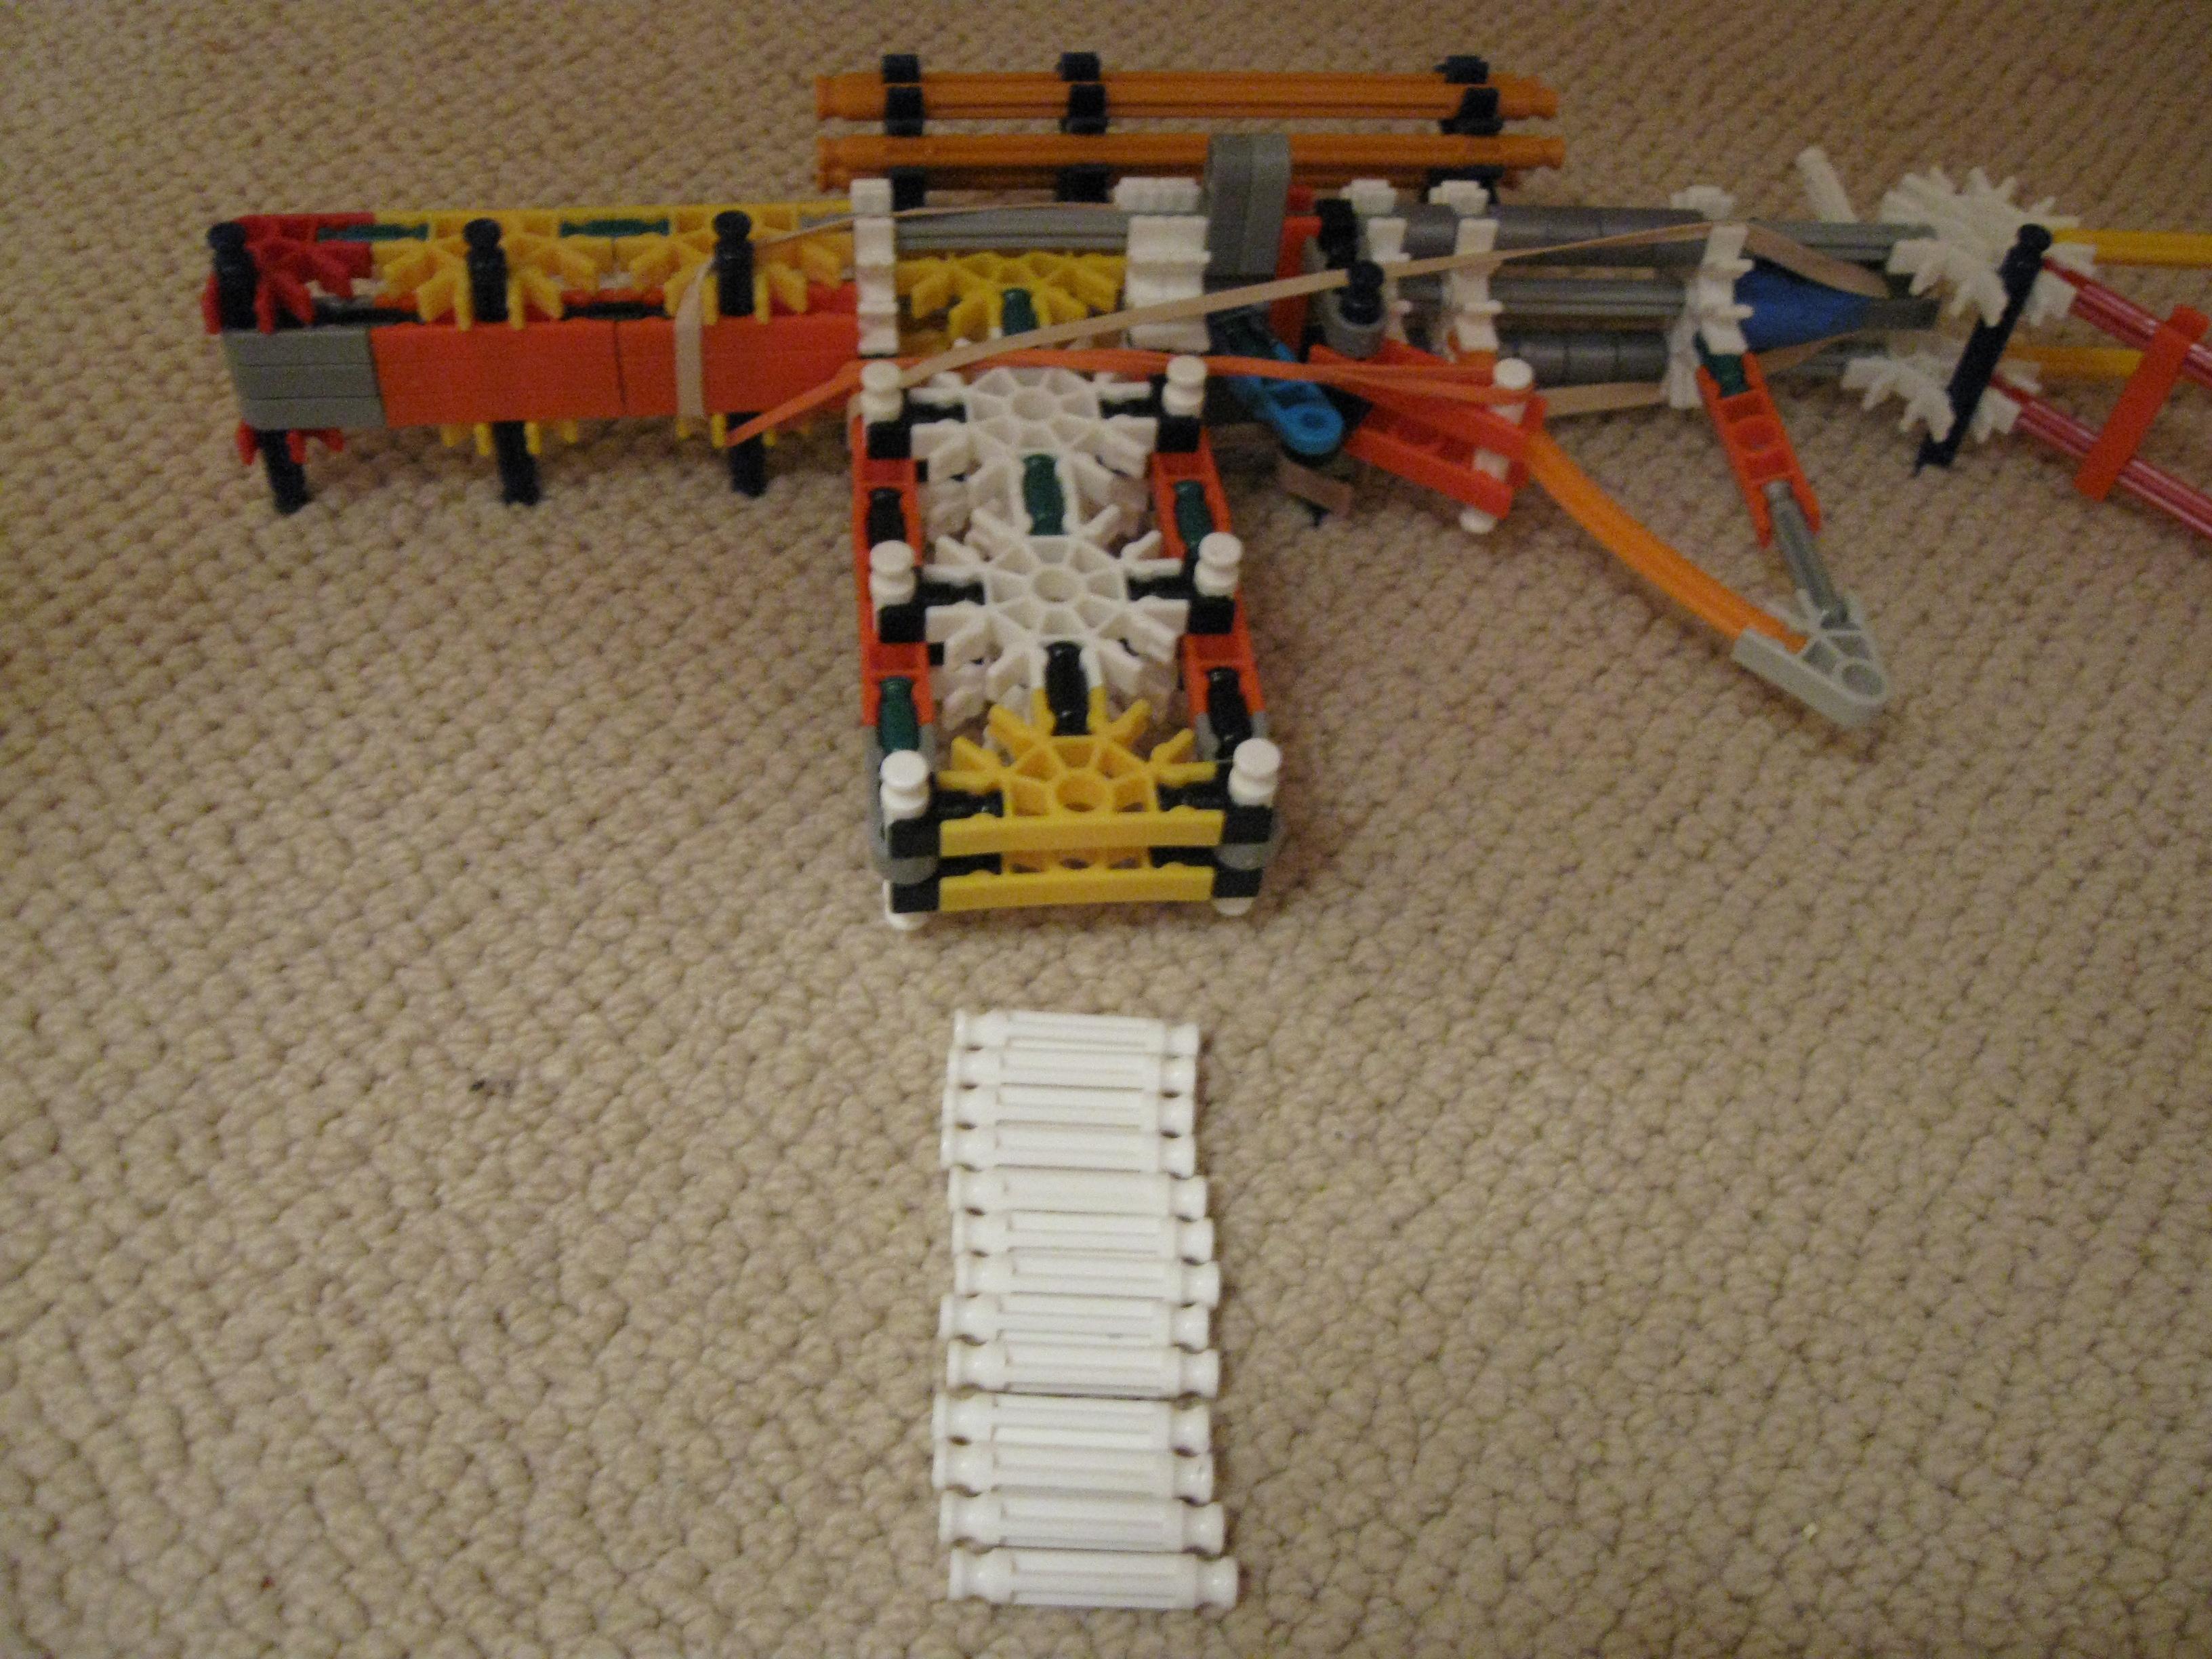 Knex Small Assault Rifle